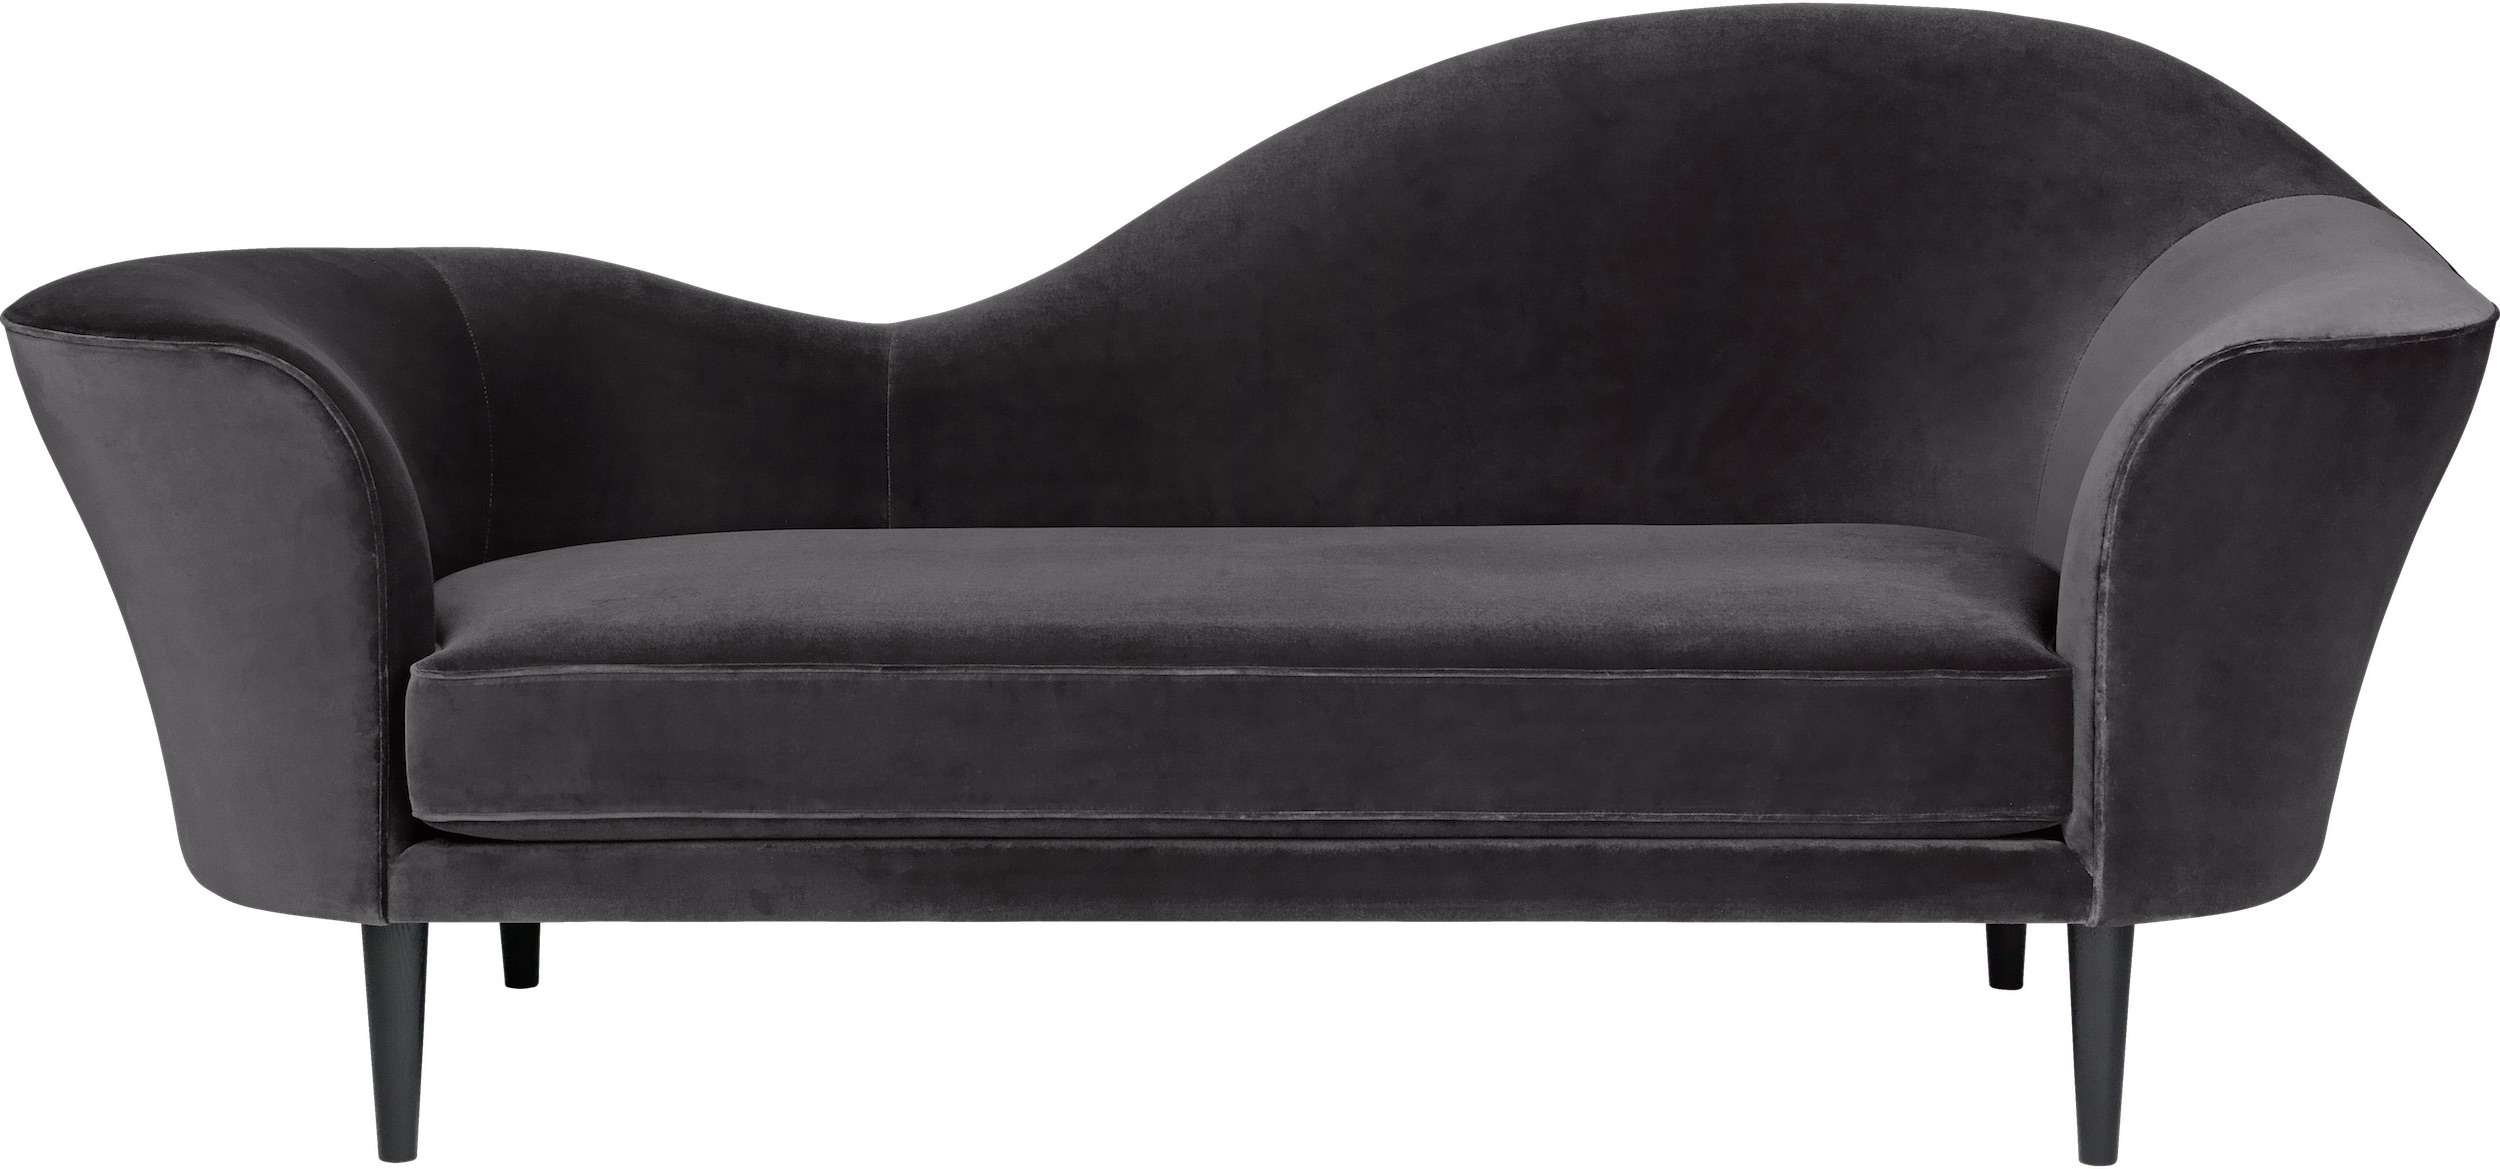 Gubi Grand Piano Sofa Design Gubi Olsen 1984